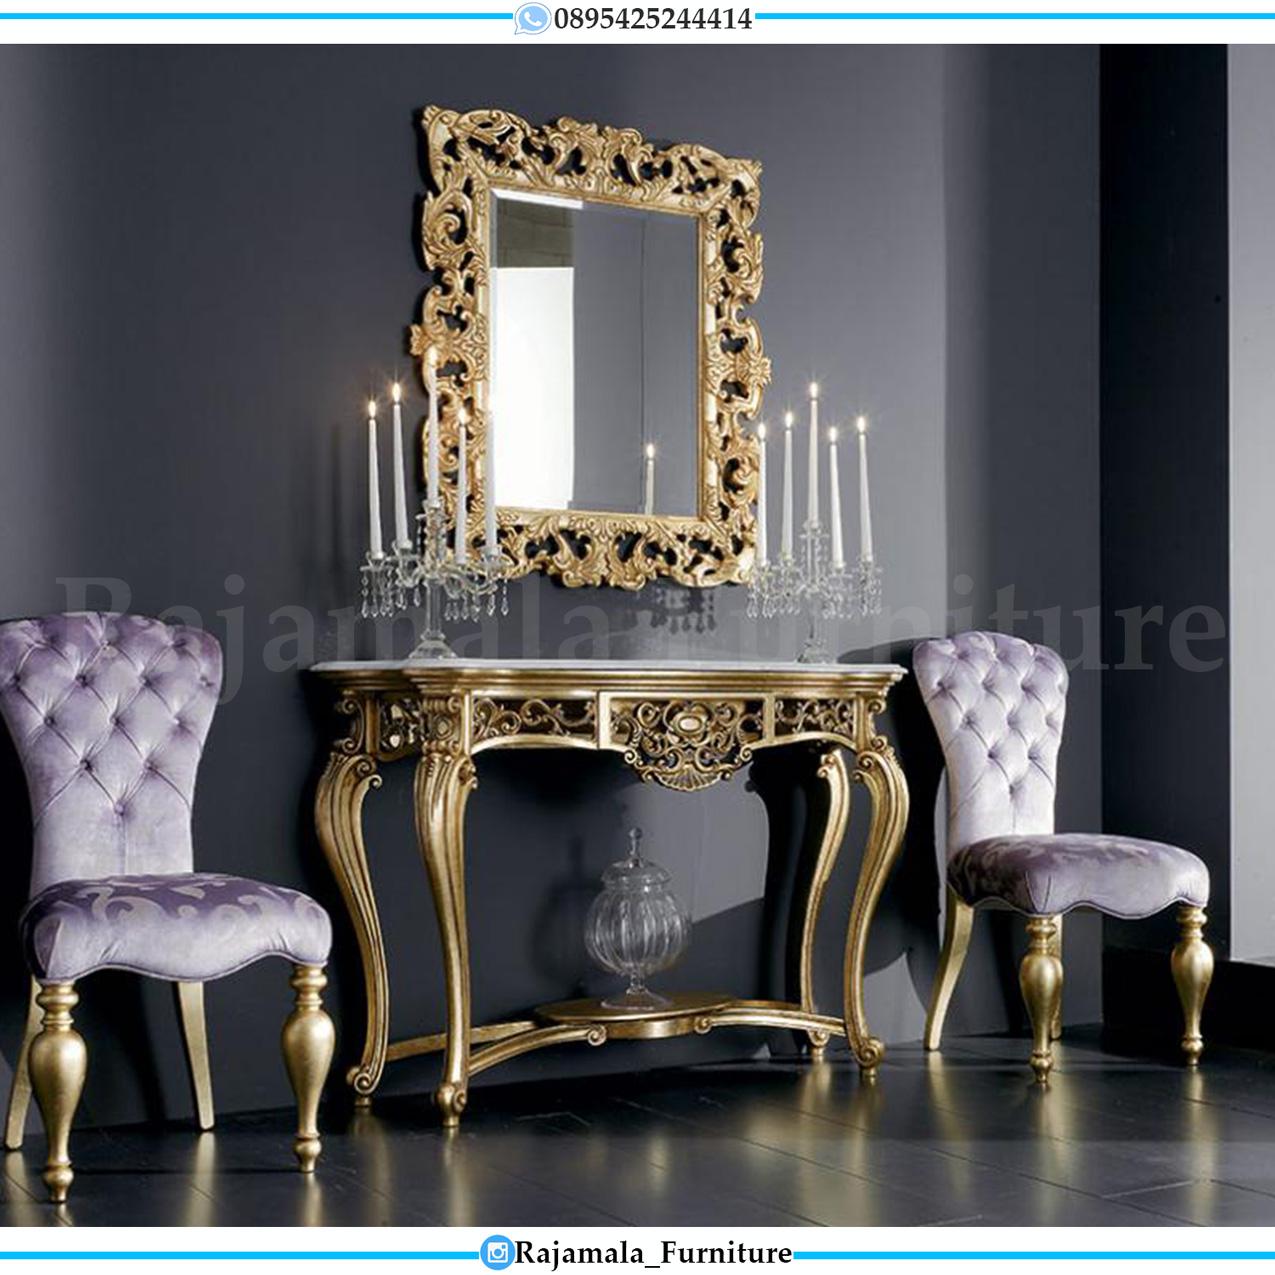 Jual Meja Konsul Mewah Luxury Carving Jepara New Style Italiansky RM-0282